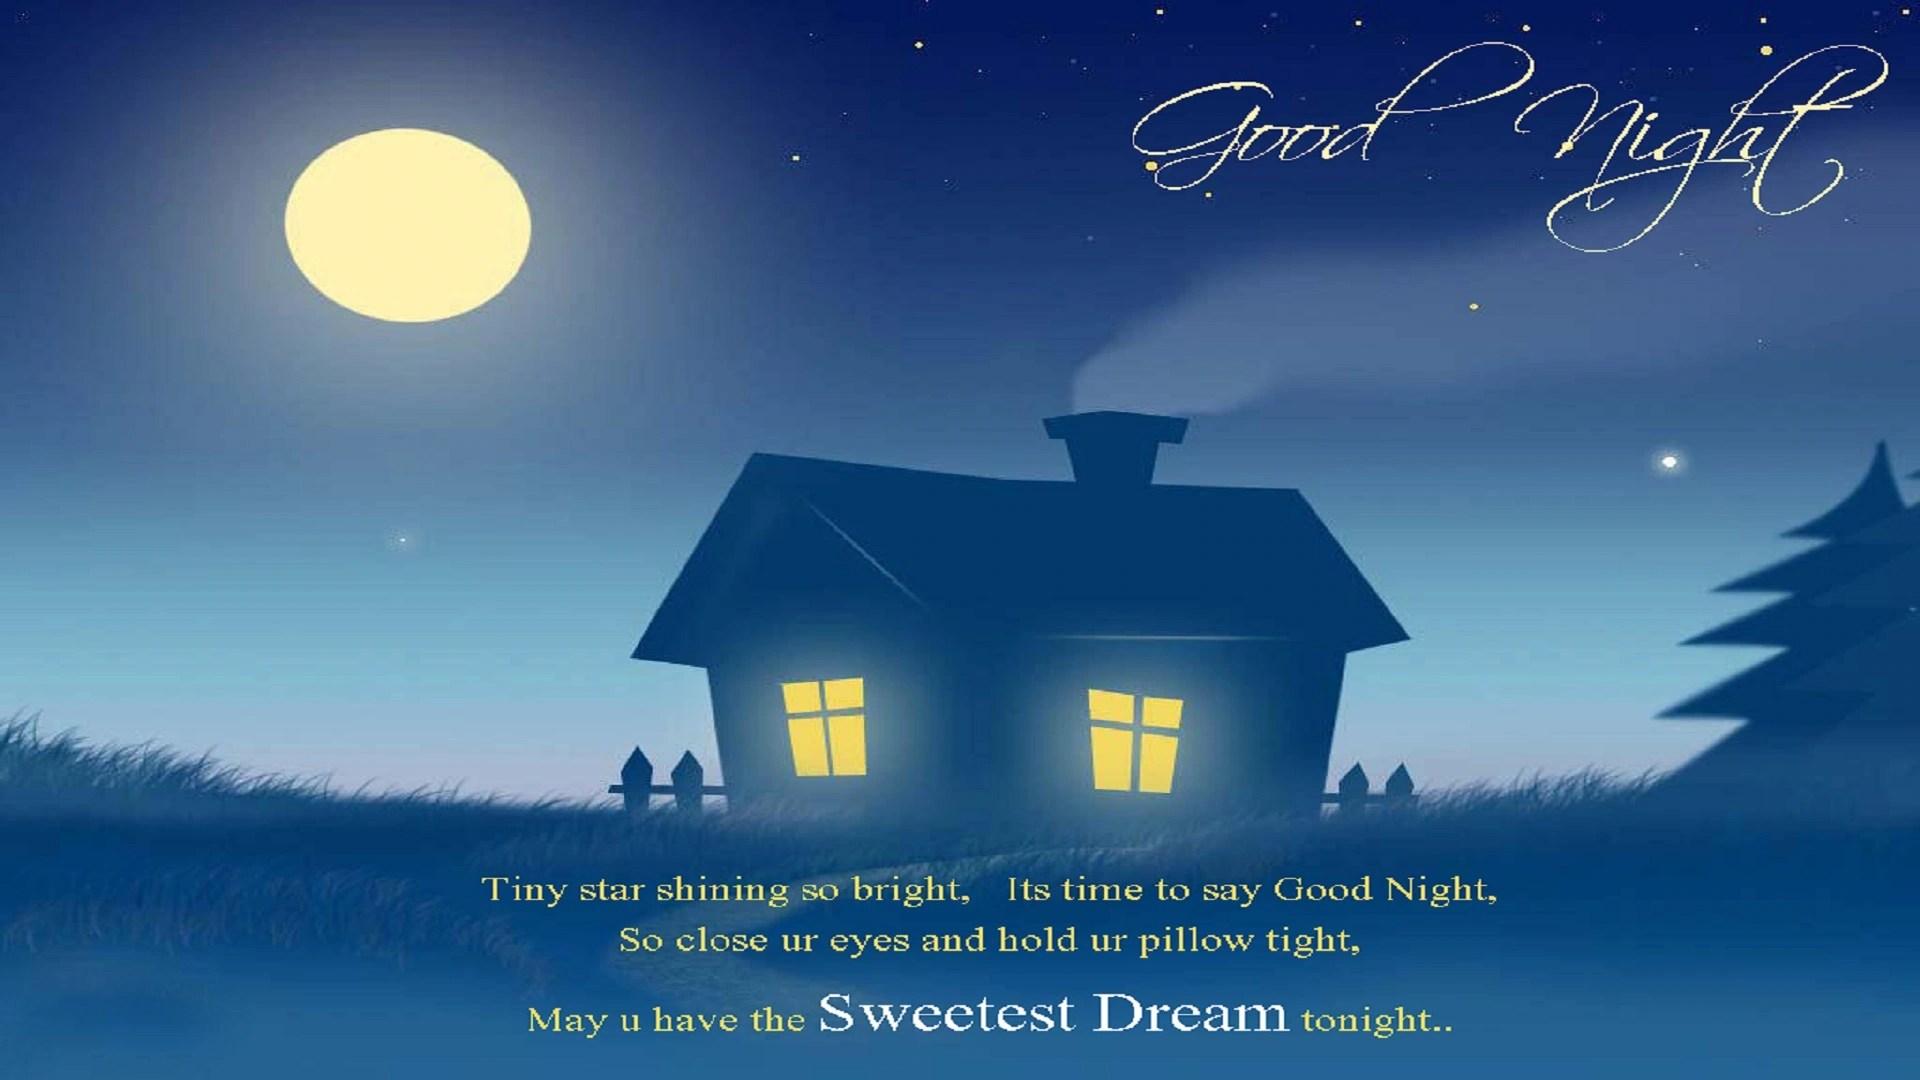 good night sweet dreams moon image